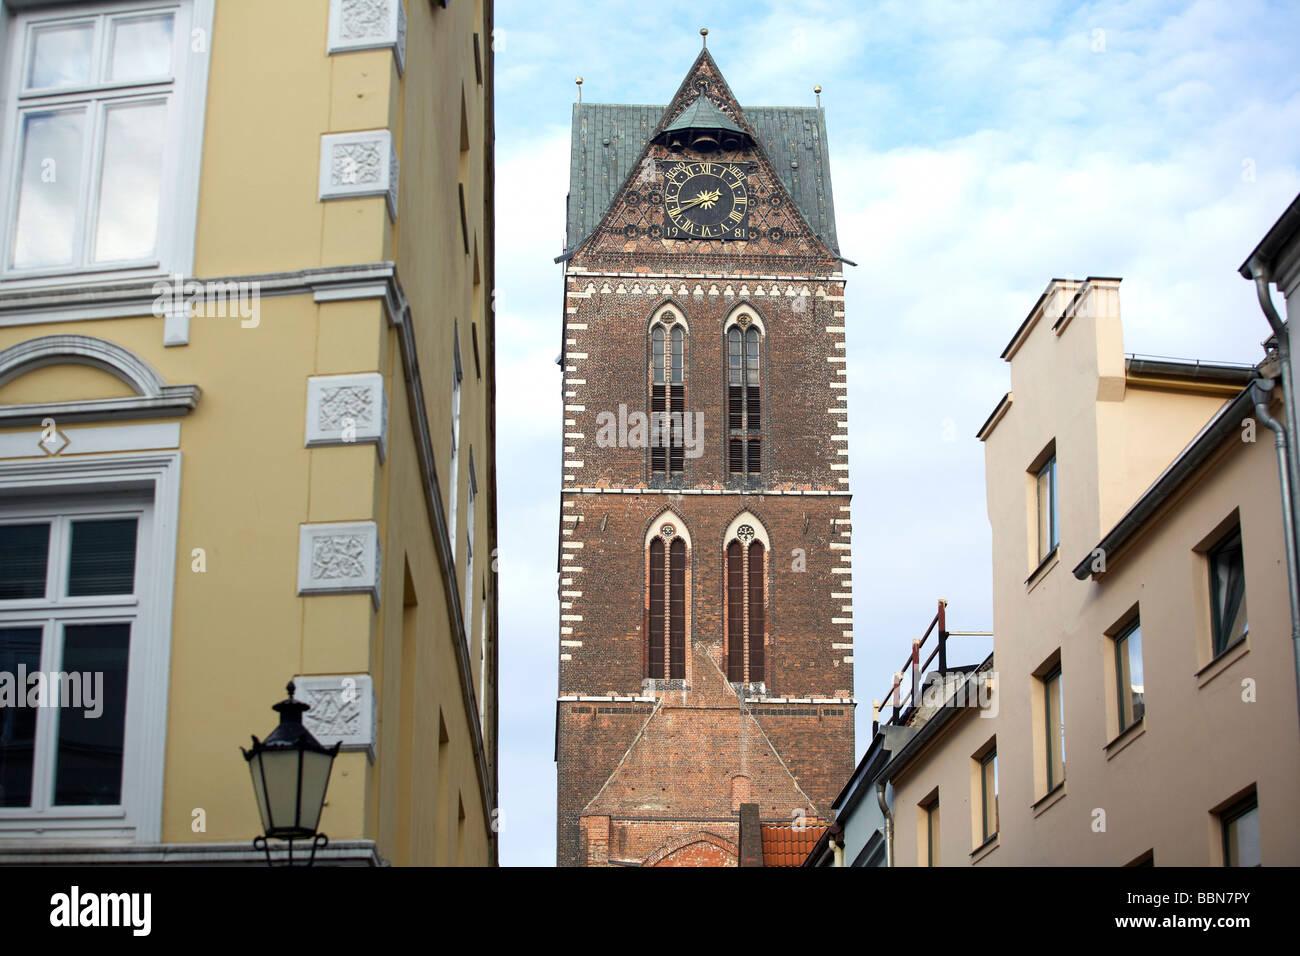 The spire of St. Marien, St. Mary church, Wismar, Mecklenburg-Western Pomerania, Germany, Europe - Stock Image